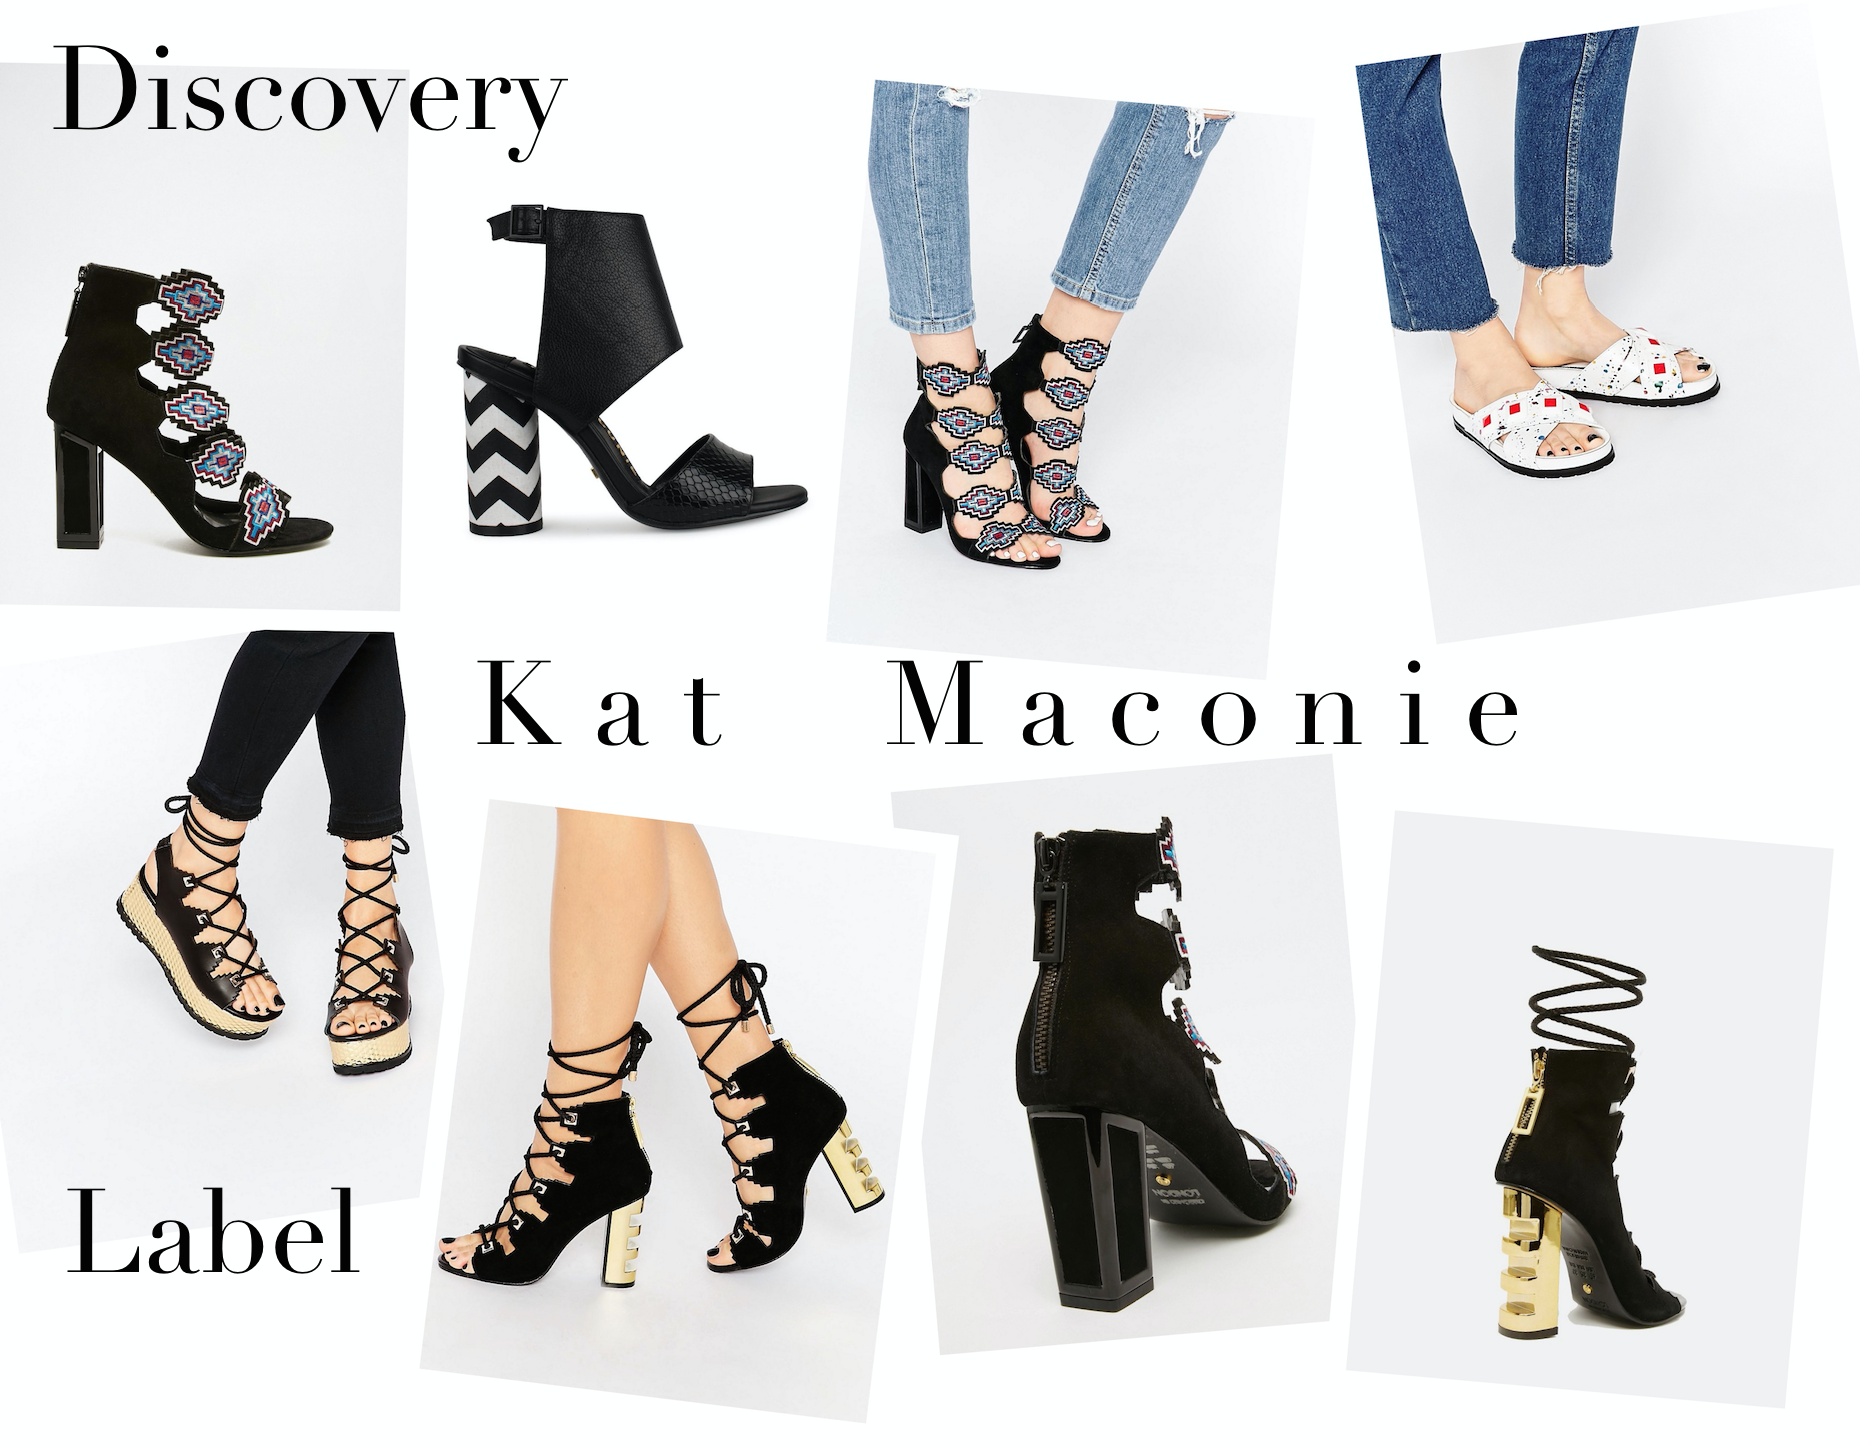 Discovery – KAT MACONIE